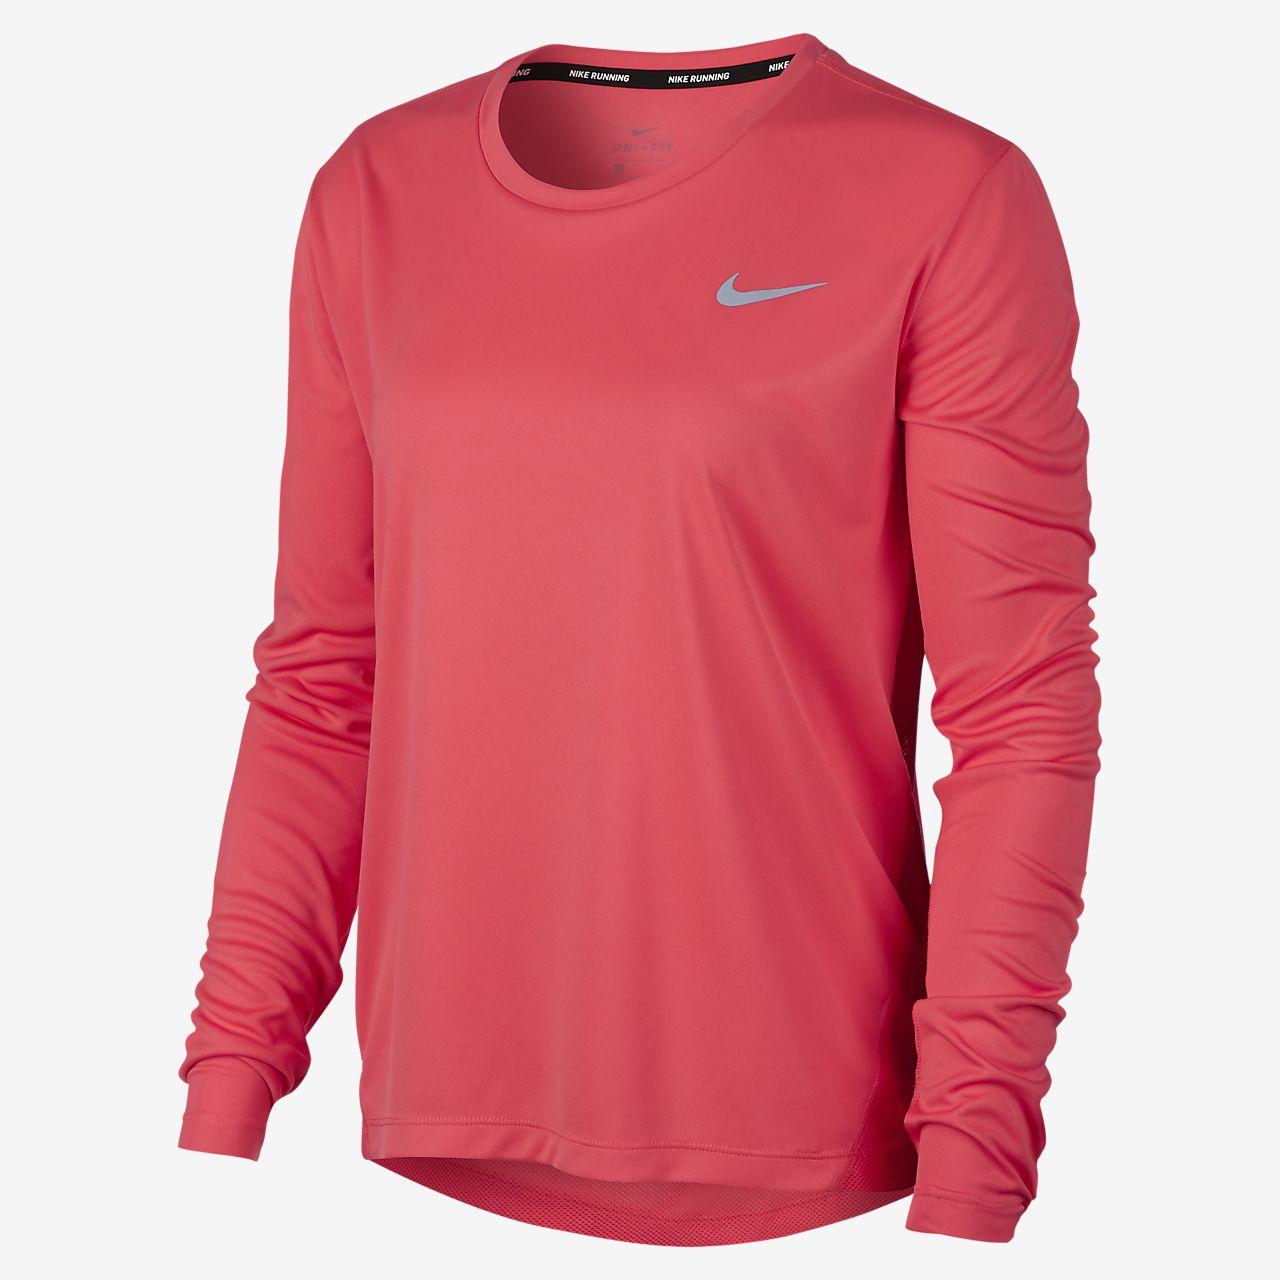 1e97d2ae Nike Ladies Miler Uv Long Sleeve Running Shirt – EDGE Engineering ...